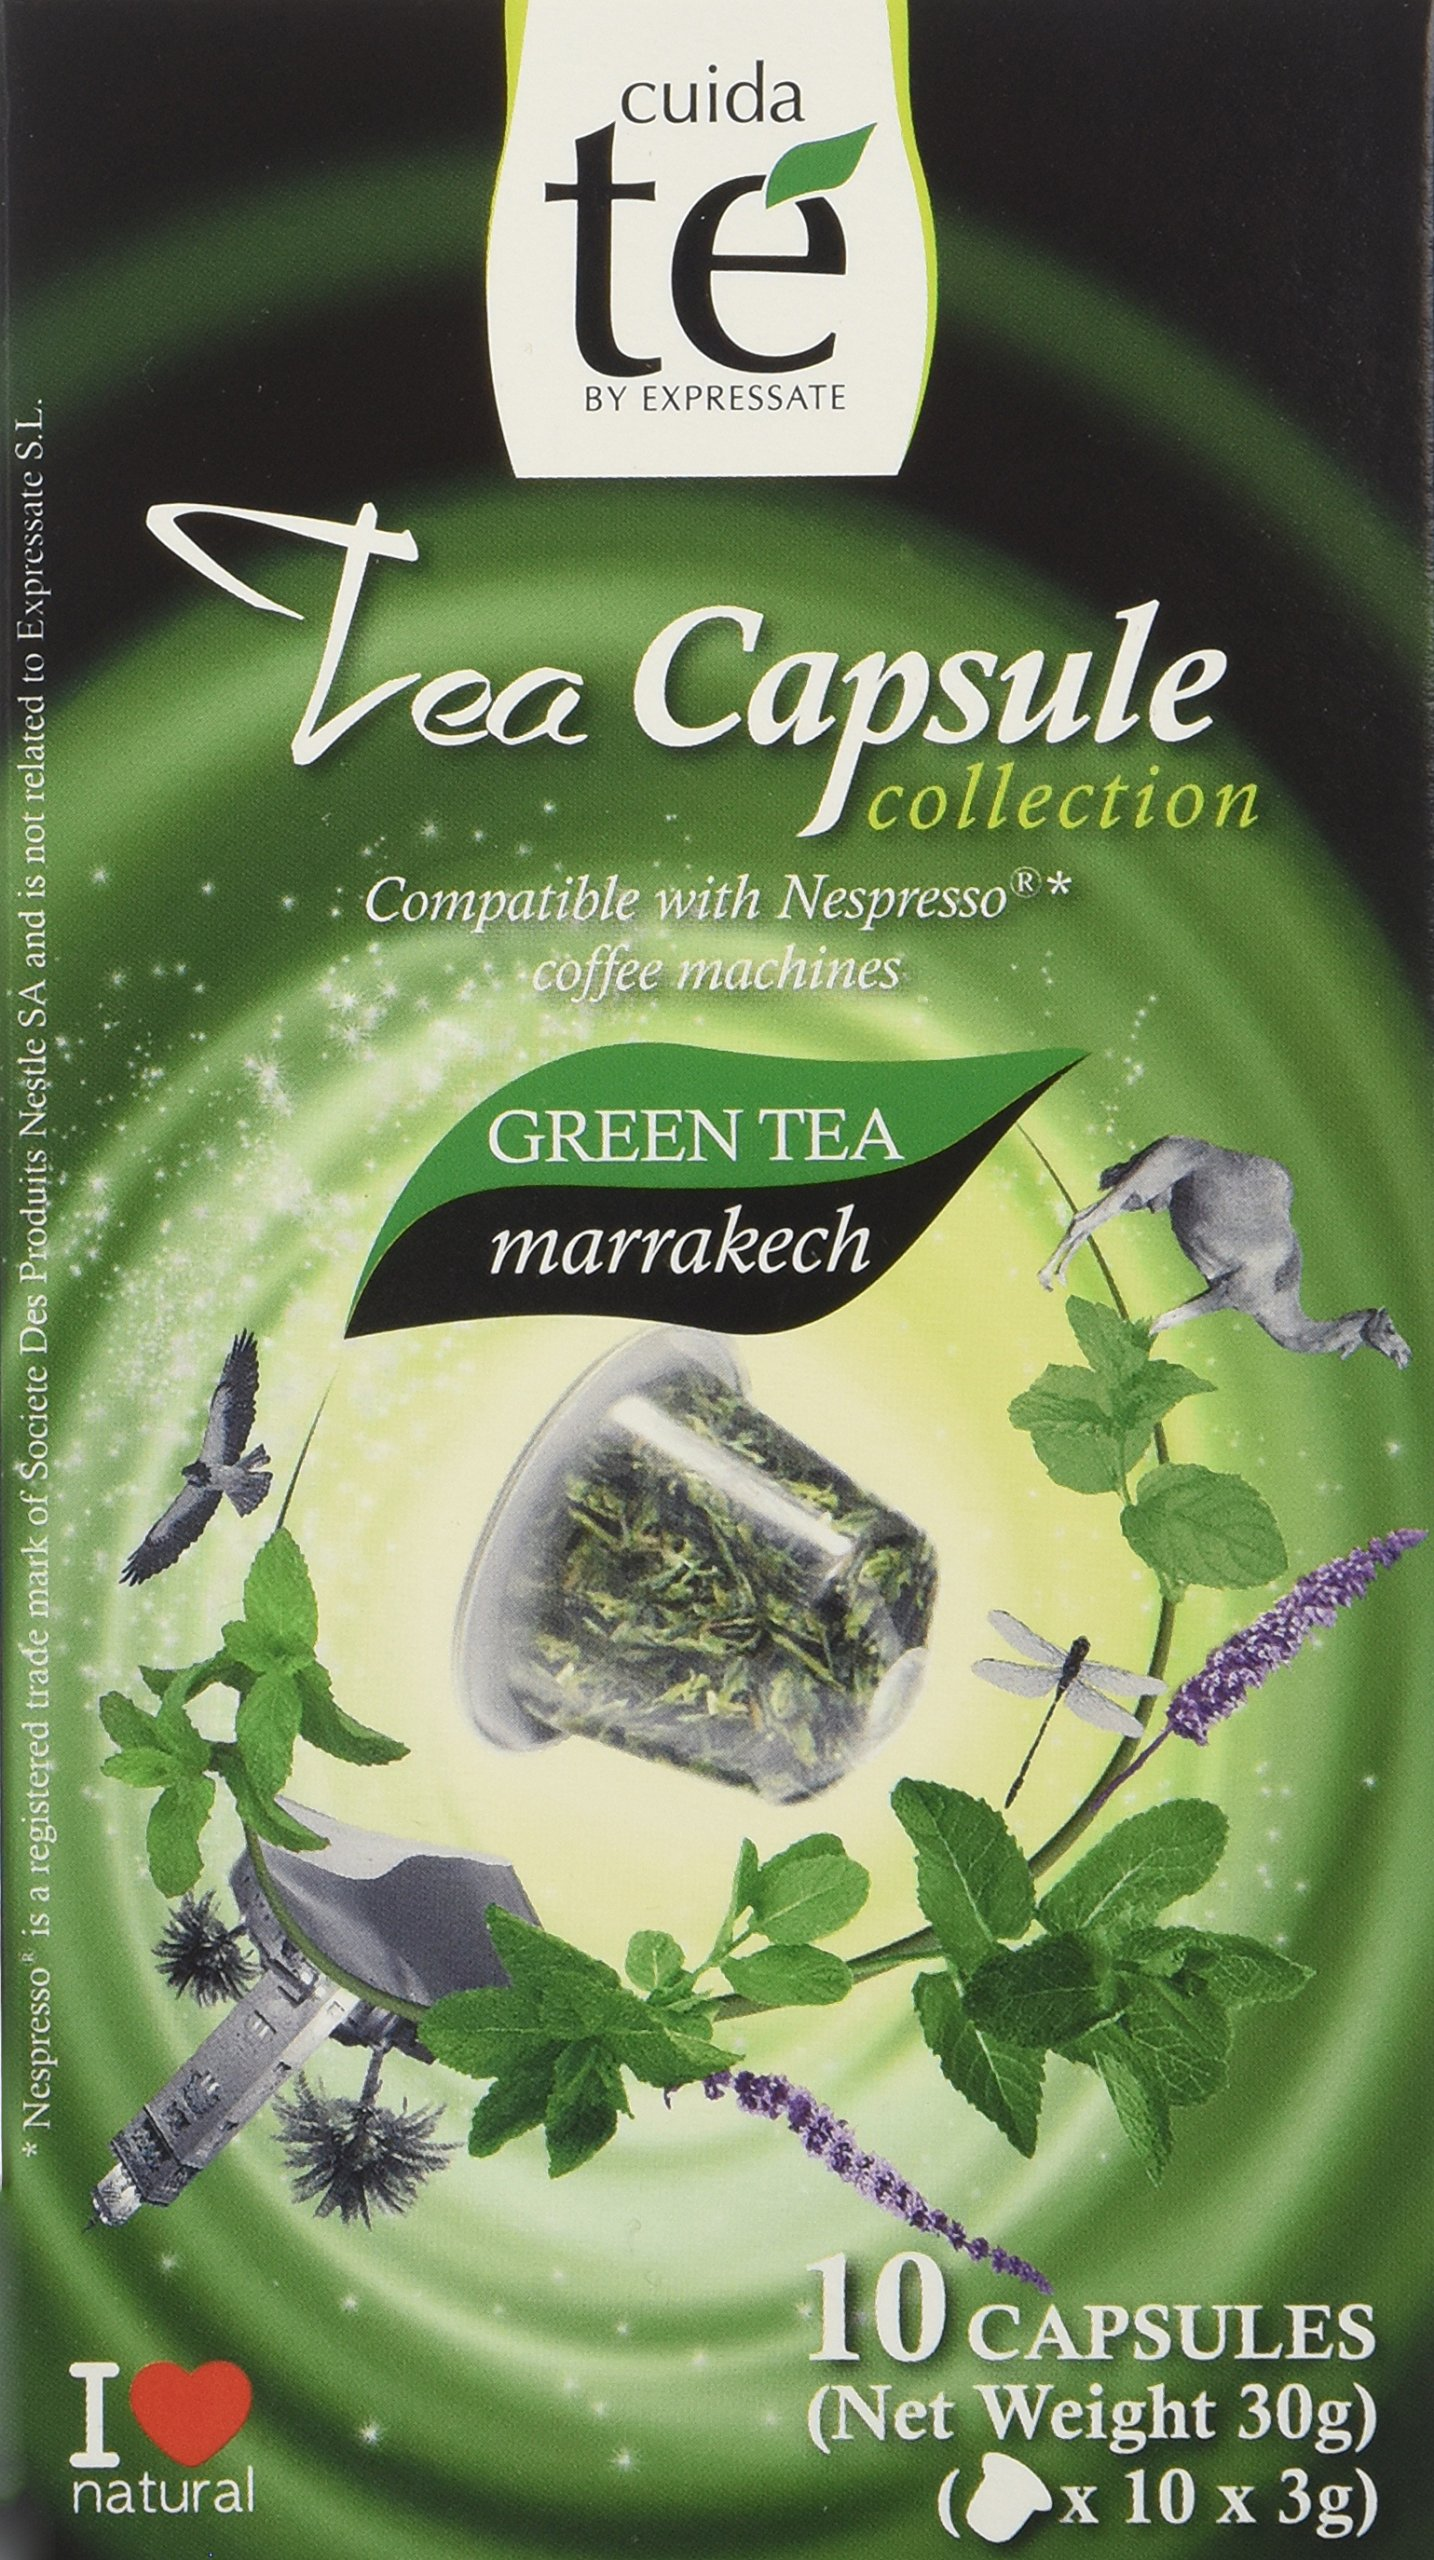 30 Nespresso Compatible Pods - Origen Tea, Marrakech Green Tea, 3 Boxes - 10 Pods / Box